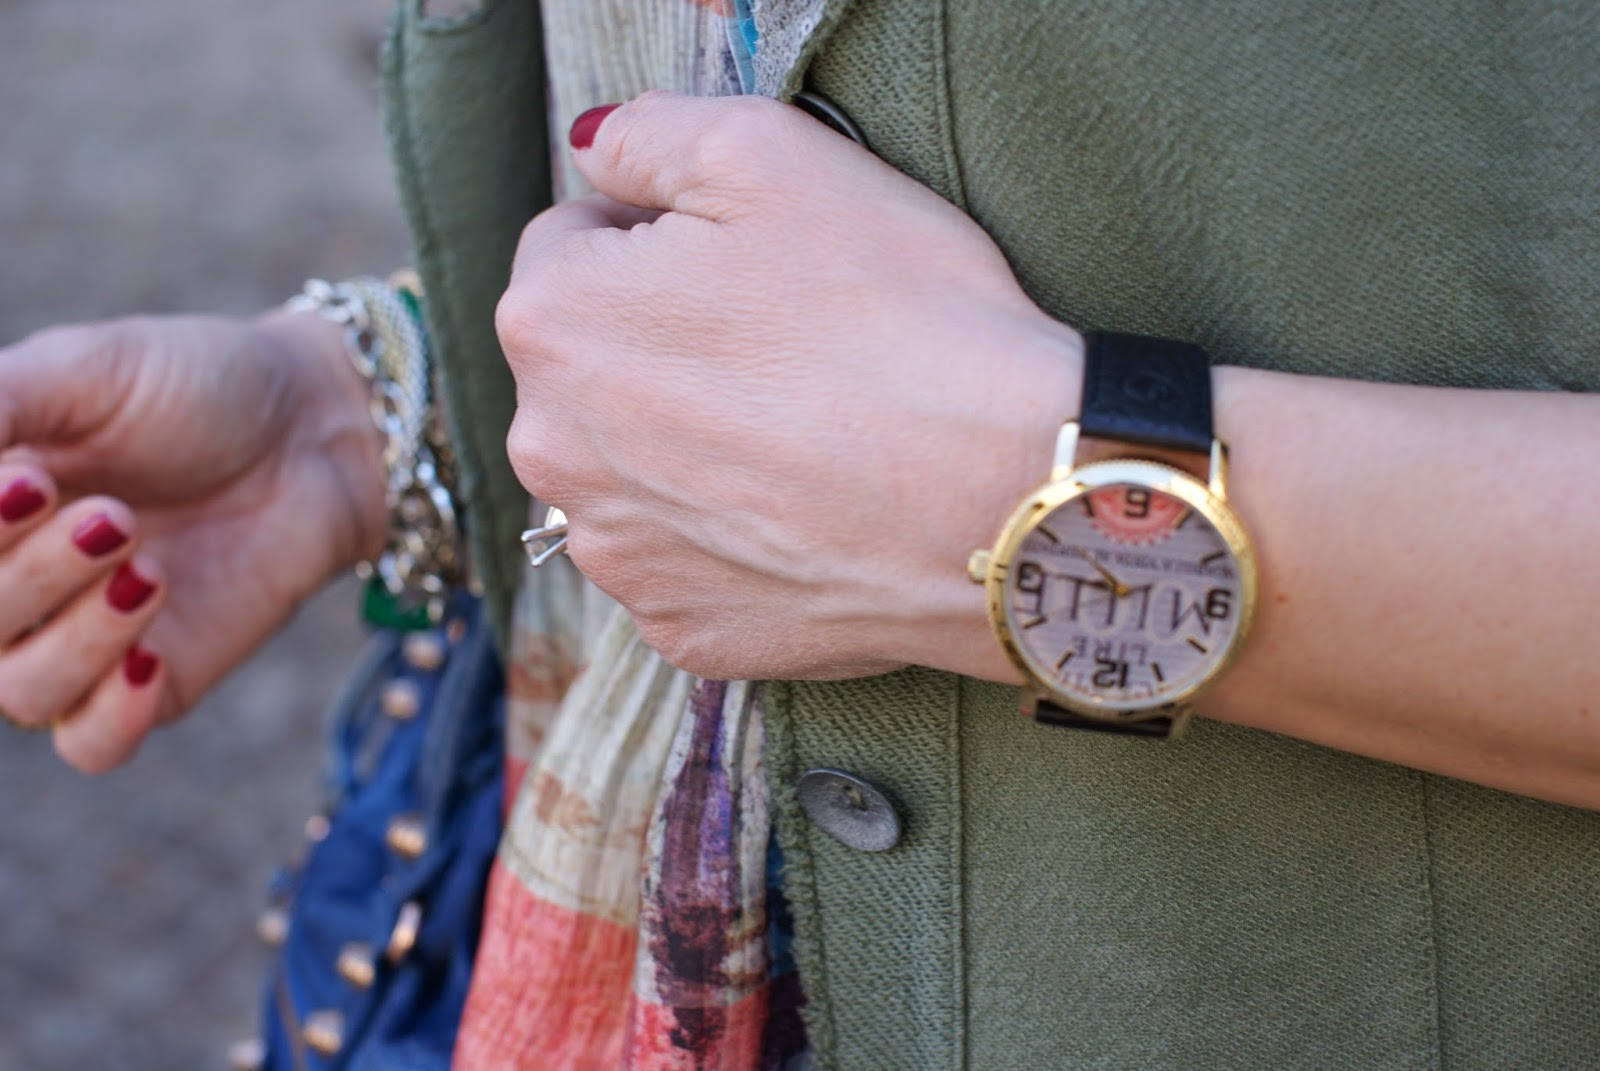 Praio sleeveless jacket, Millelire orologio, Chanel coup de coeur, Fashion and Cookies, fashion blogger